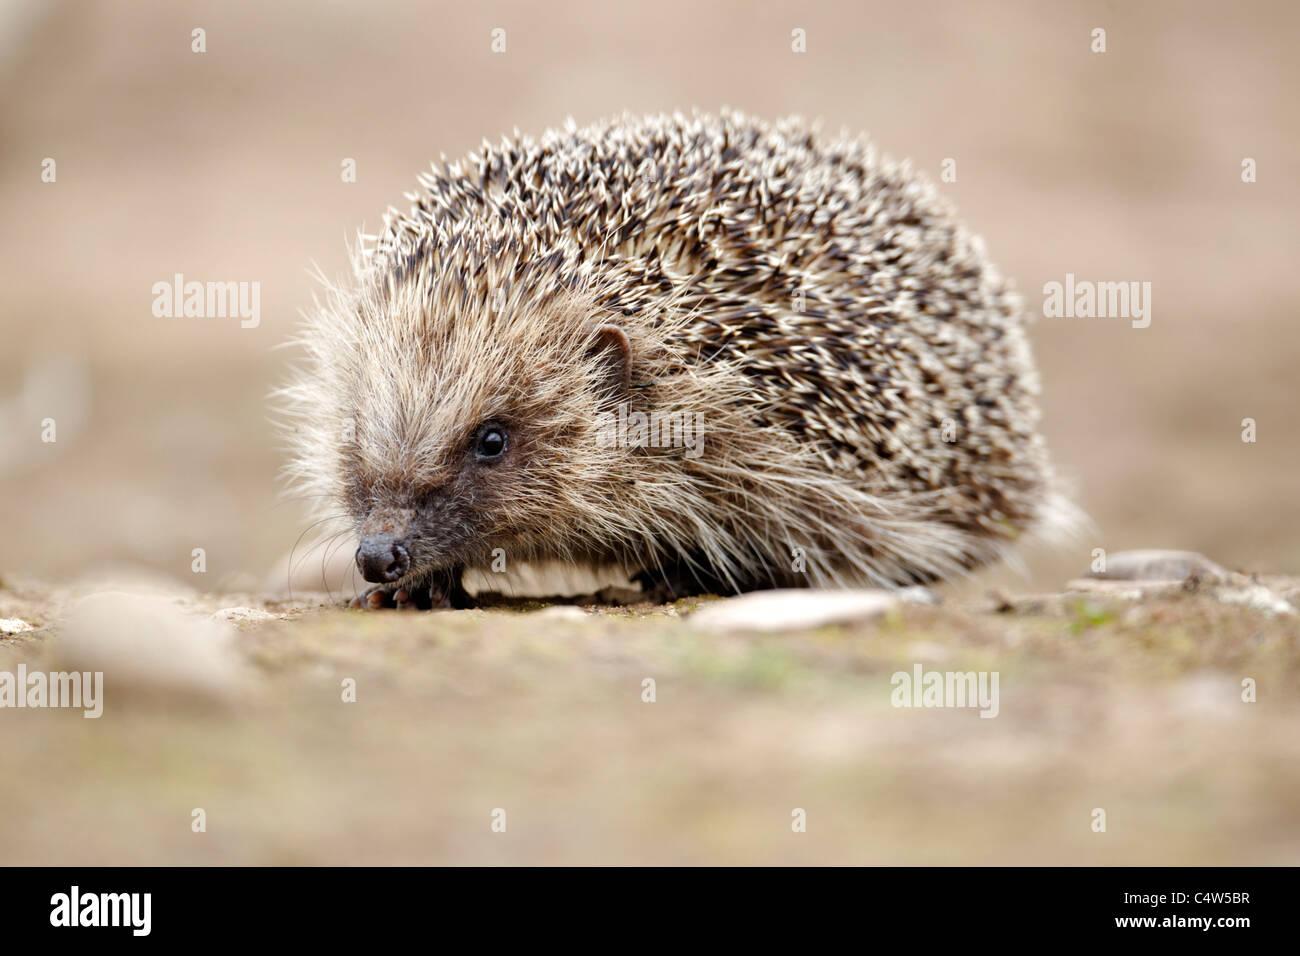 Hedgehog, Erinaceus europaeus, single mammal, Midlands, June 2011 - Stock Image